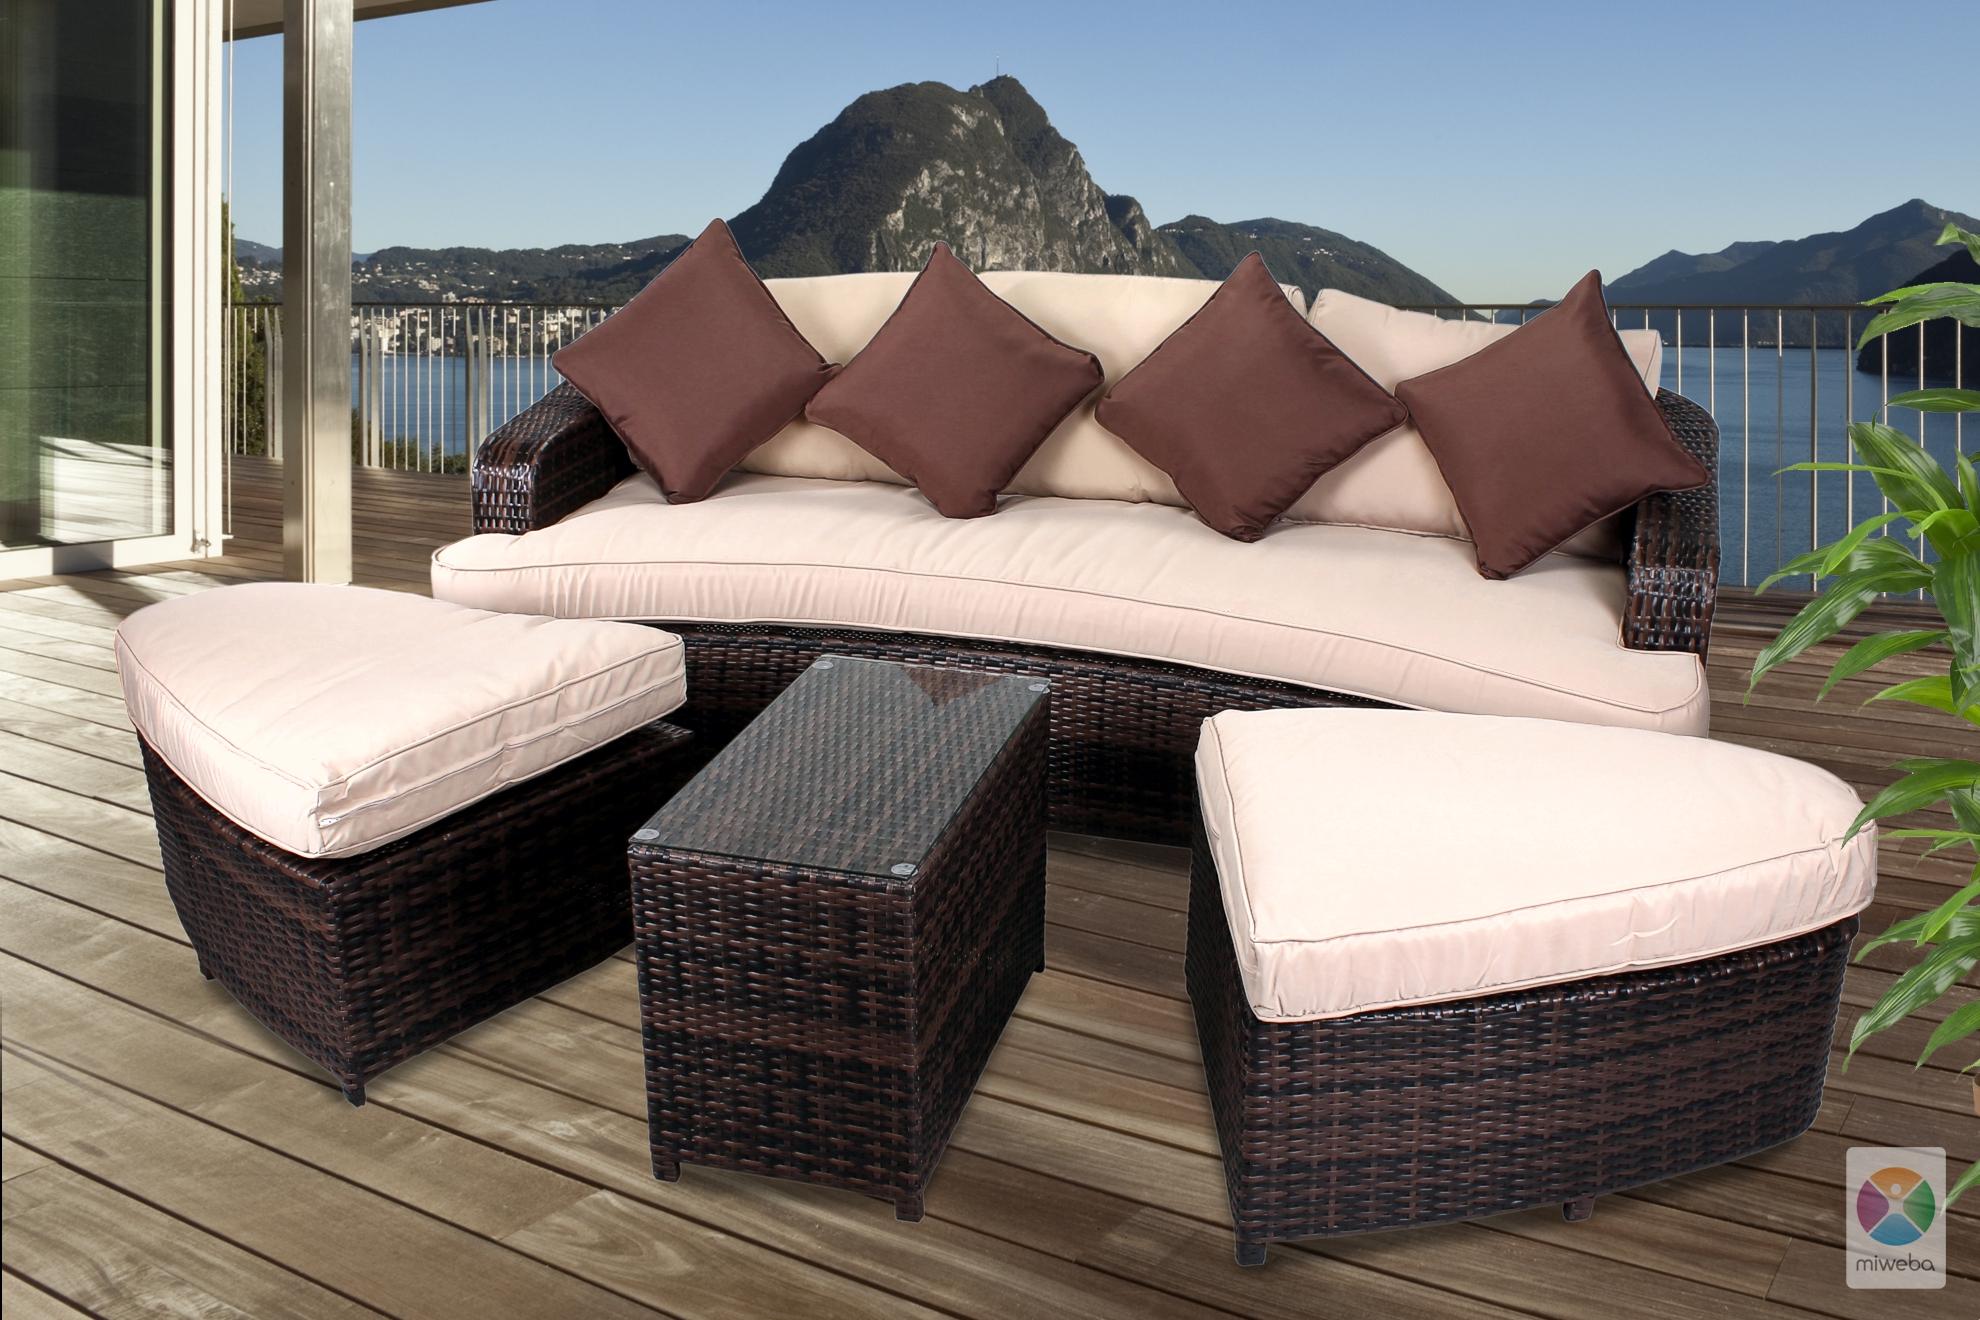 quadfactory bottrop miweba caribbian polyrattan lounge. Black Bedroom Furniture Sets. Home Design Ideas